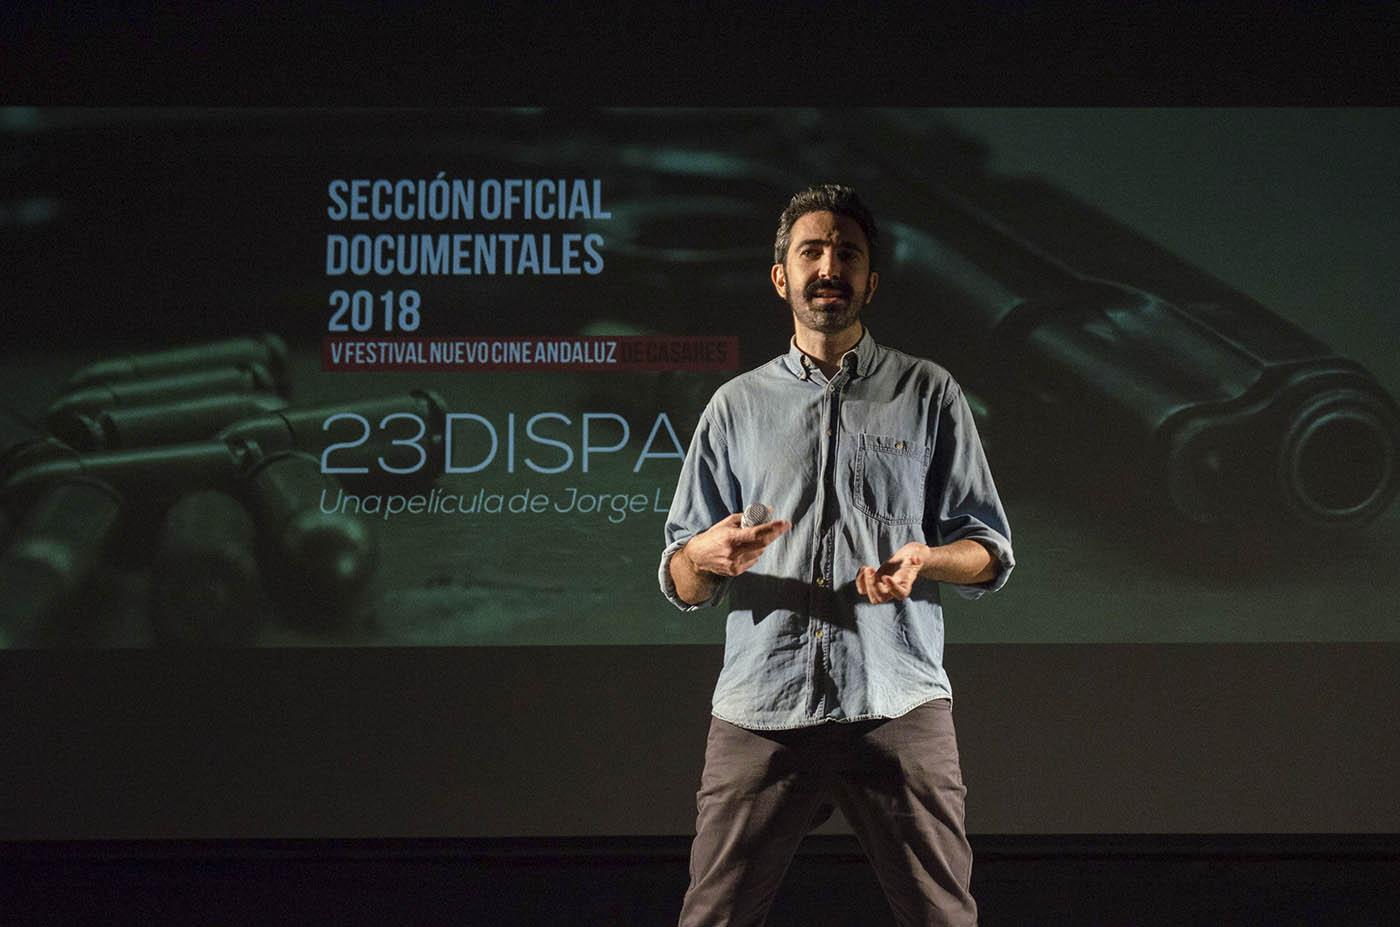 23 disparos, mejor documental Nuevo Cine Andaluz 2018